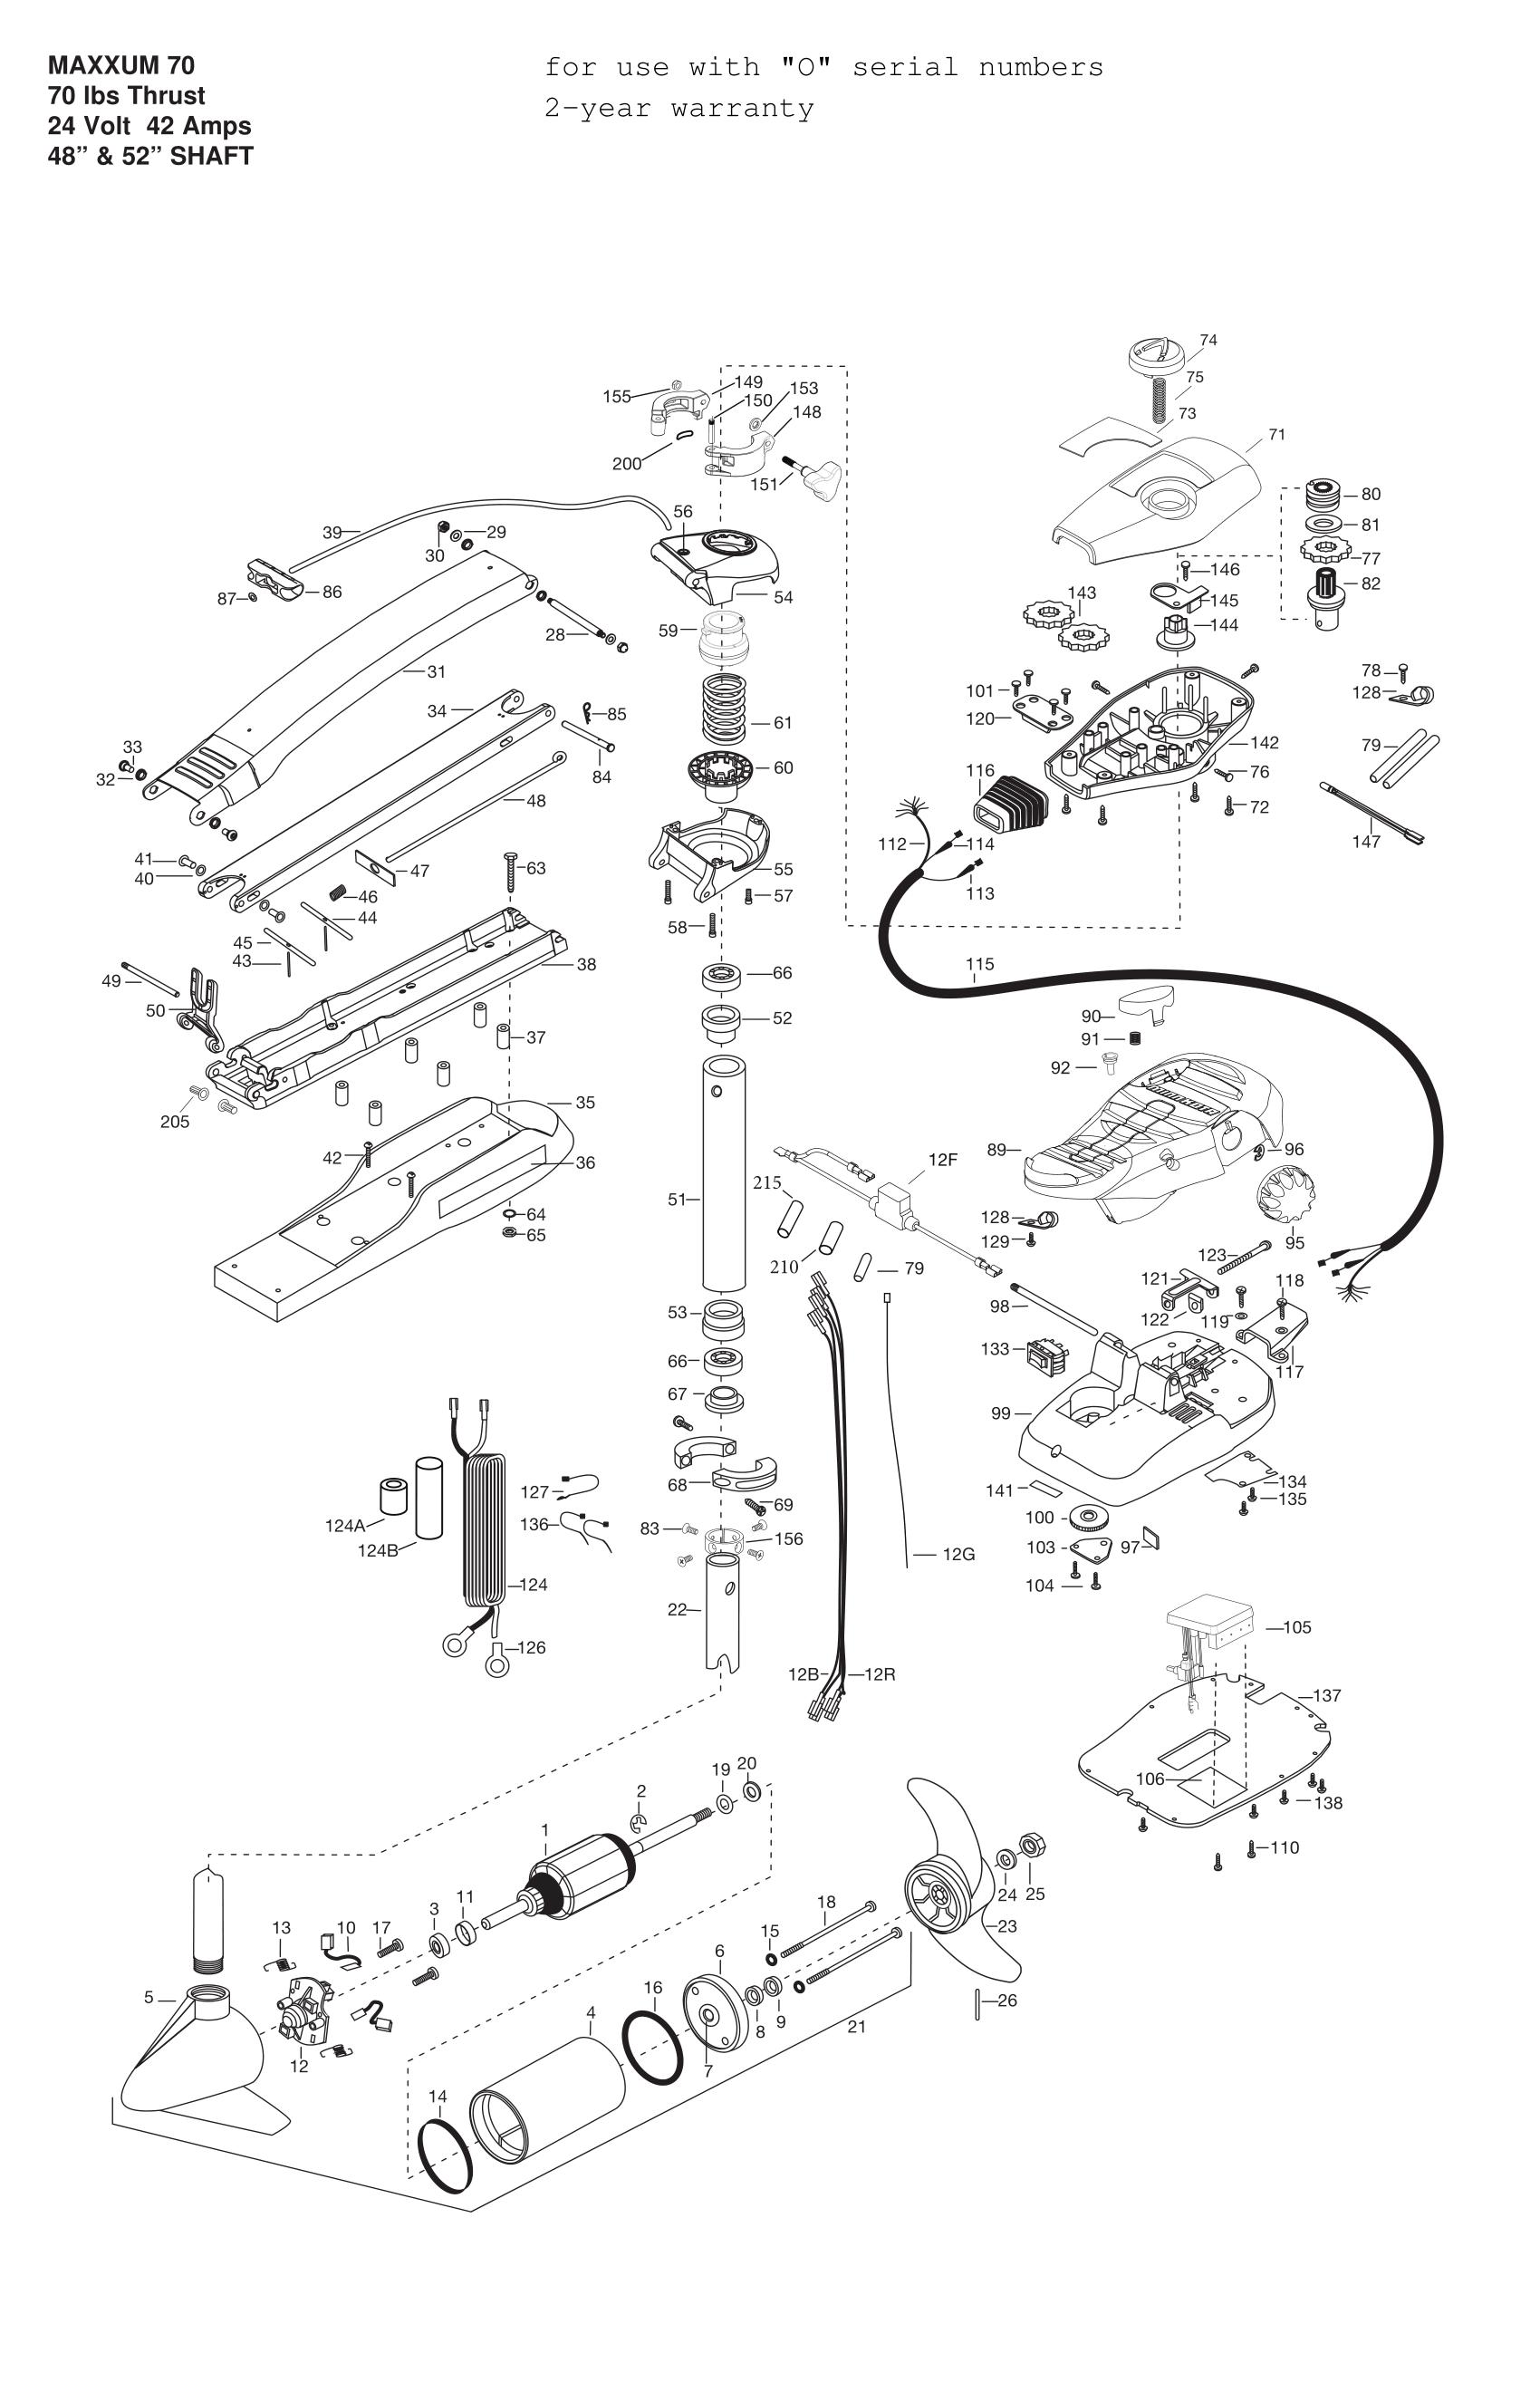 2014-mk-maxxum-70-52-inch-1.png